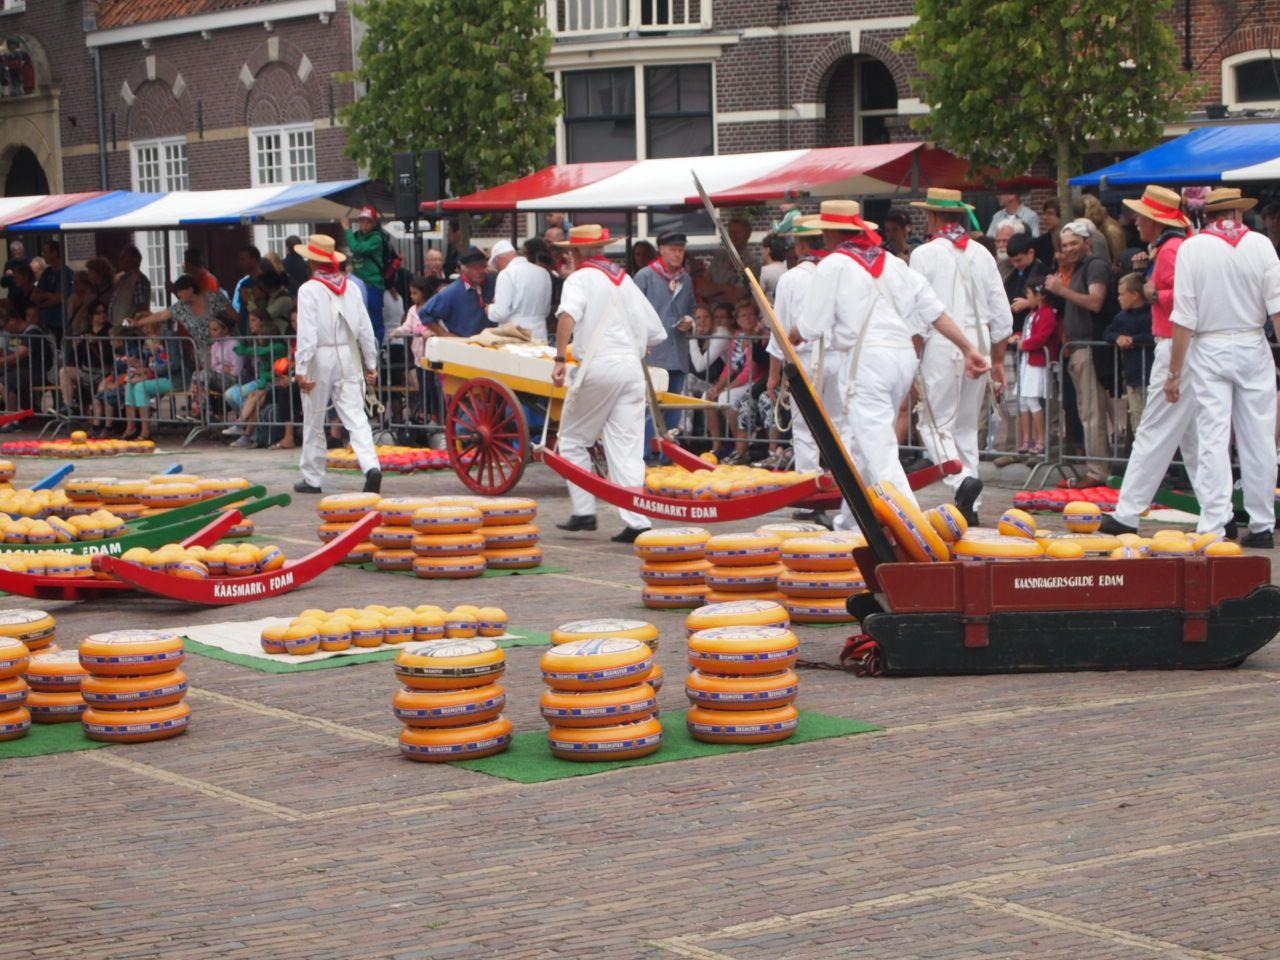 edam the Netherlands edam the Netherlands